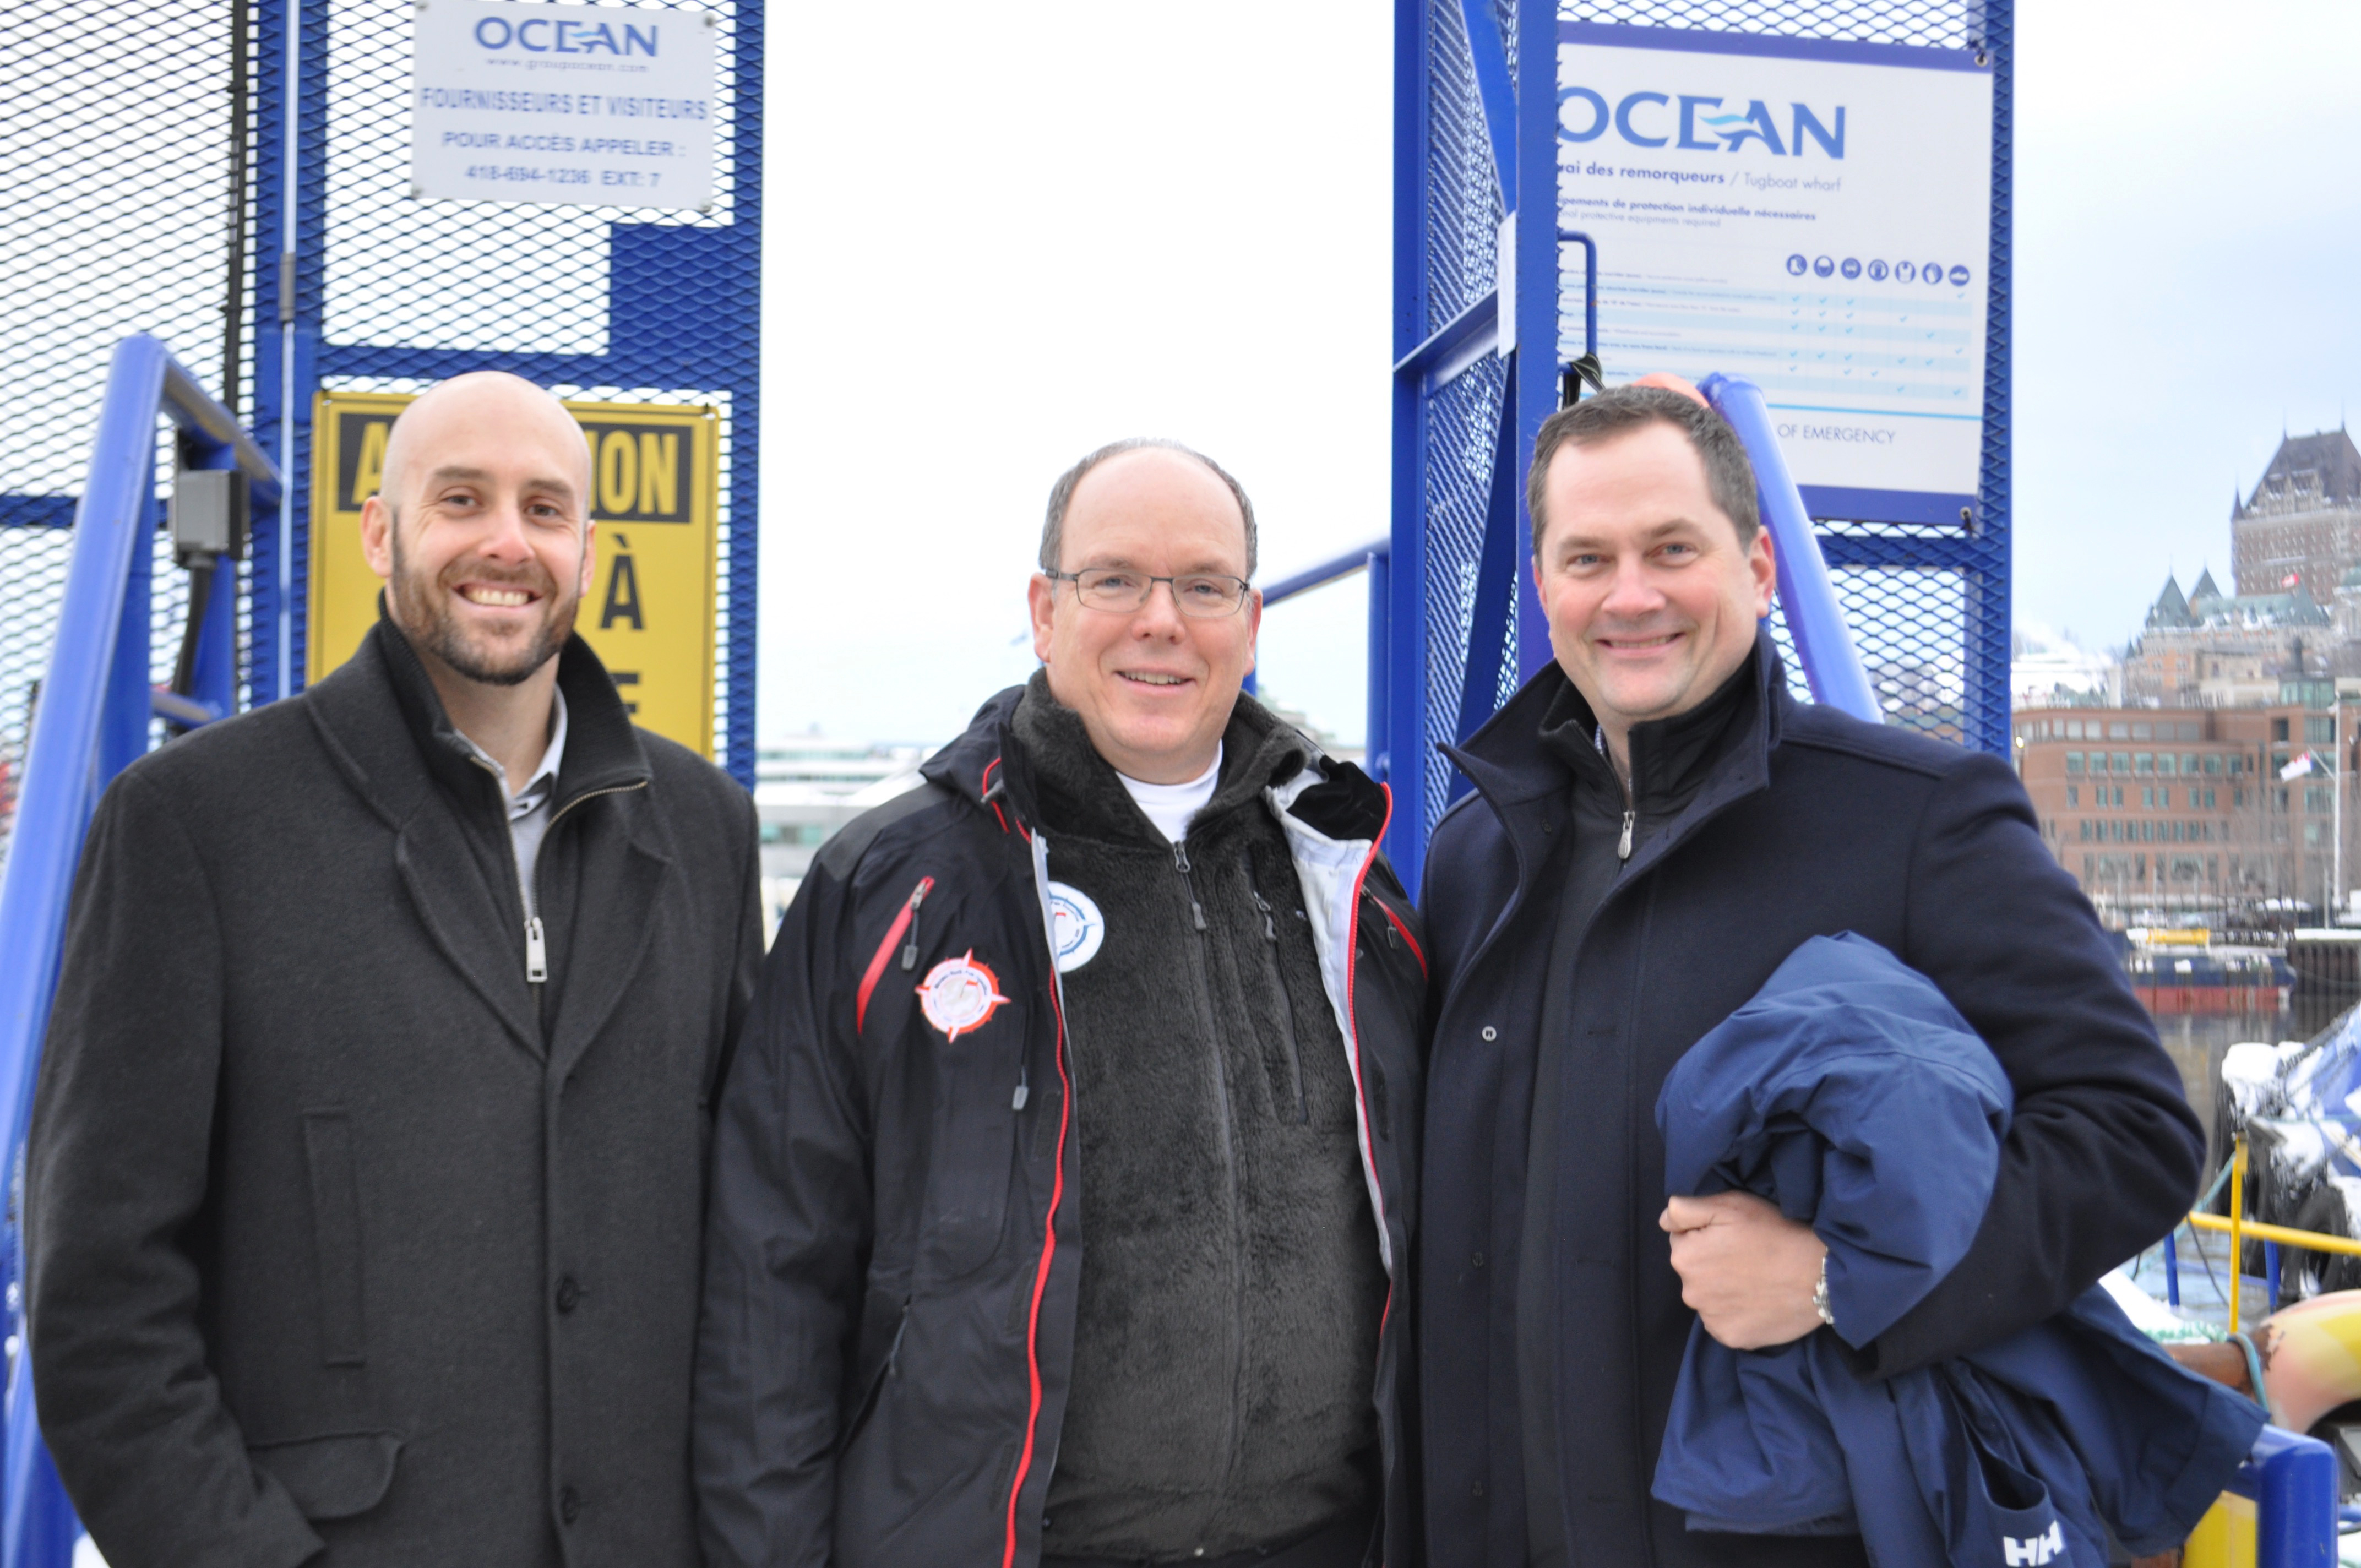 Ocean receives His Serene Highness Prince Albert II of Monaco on the OCEAN TAIGA